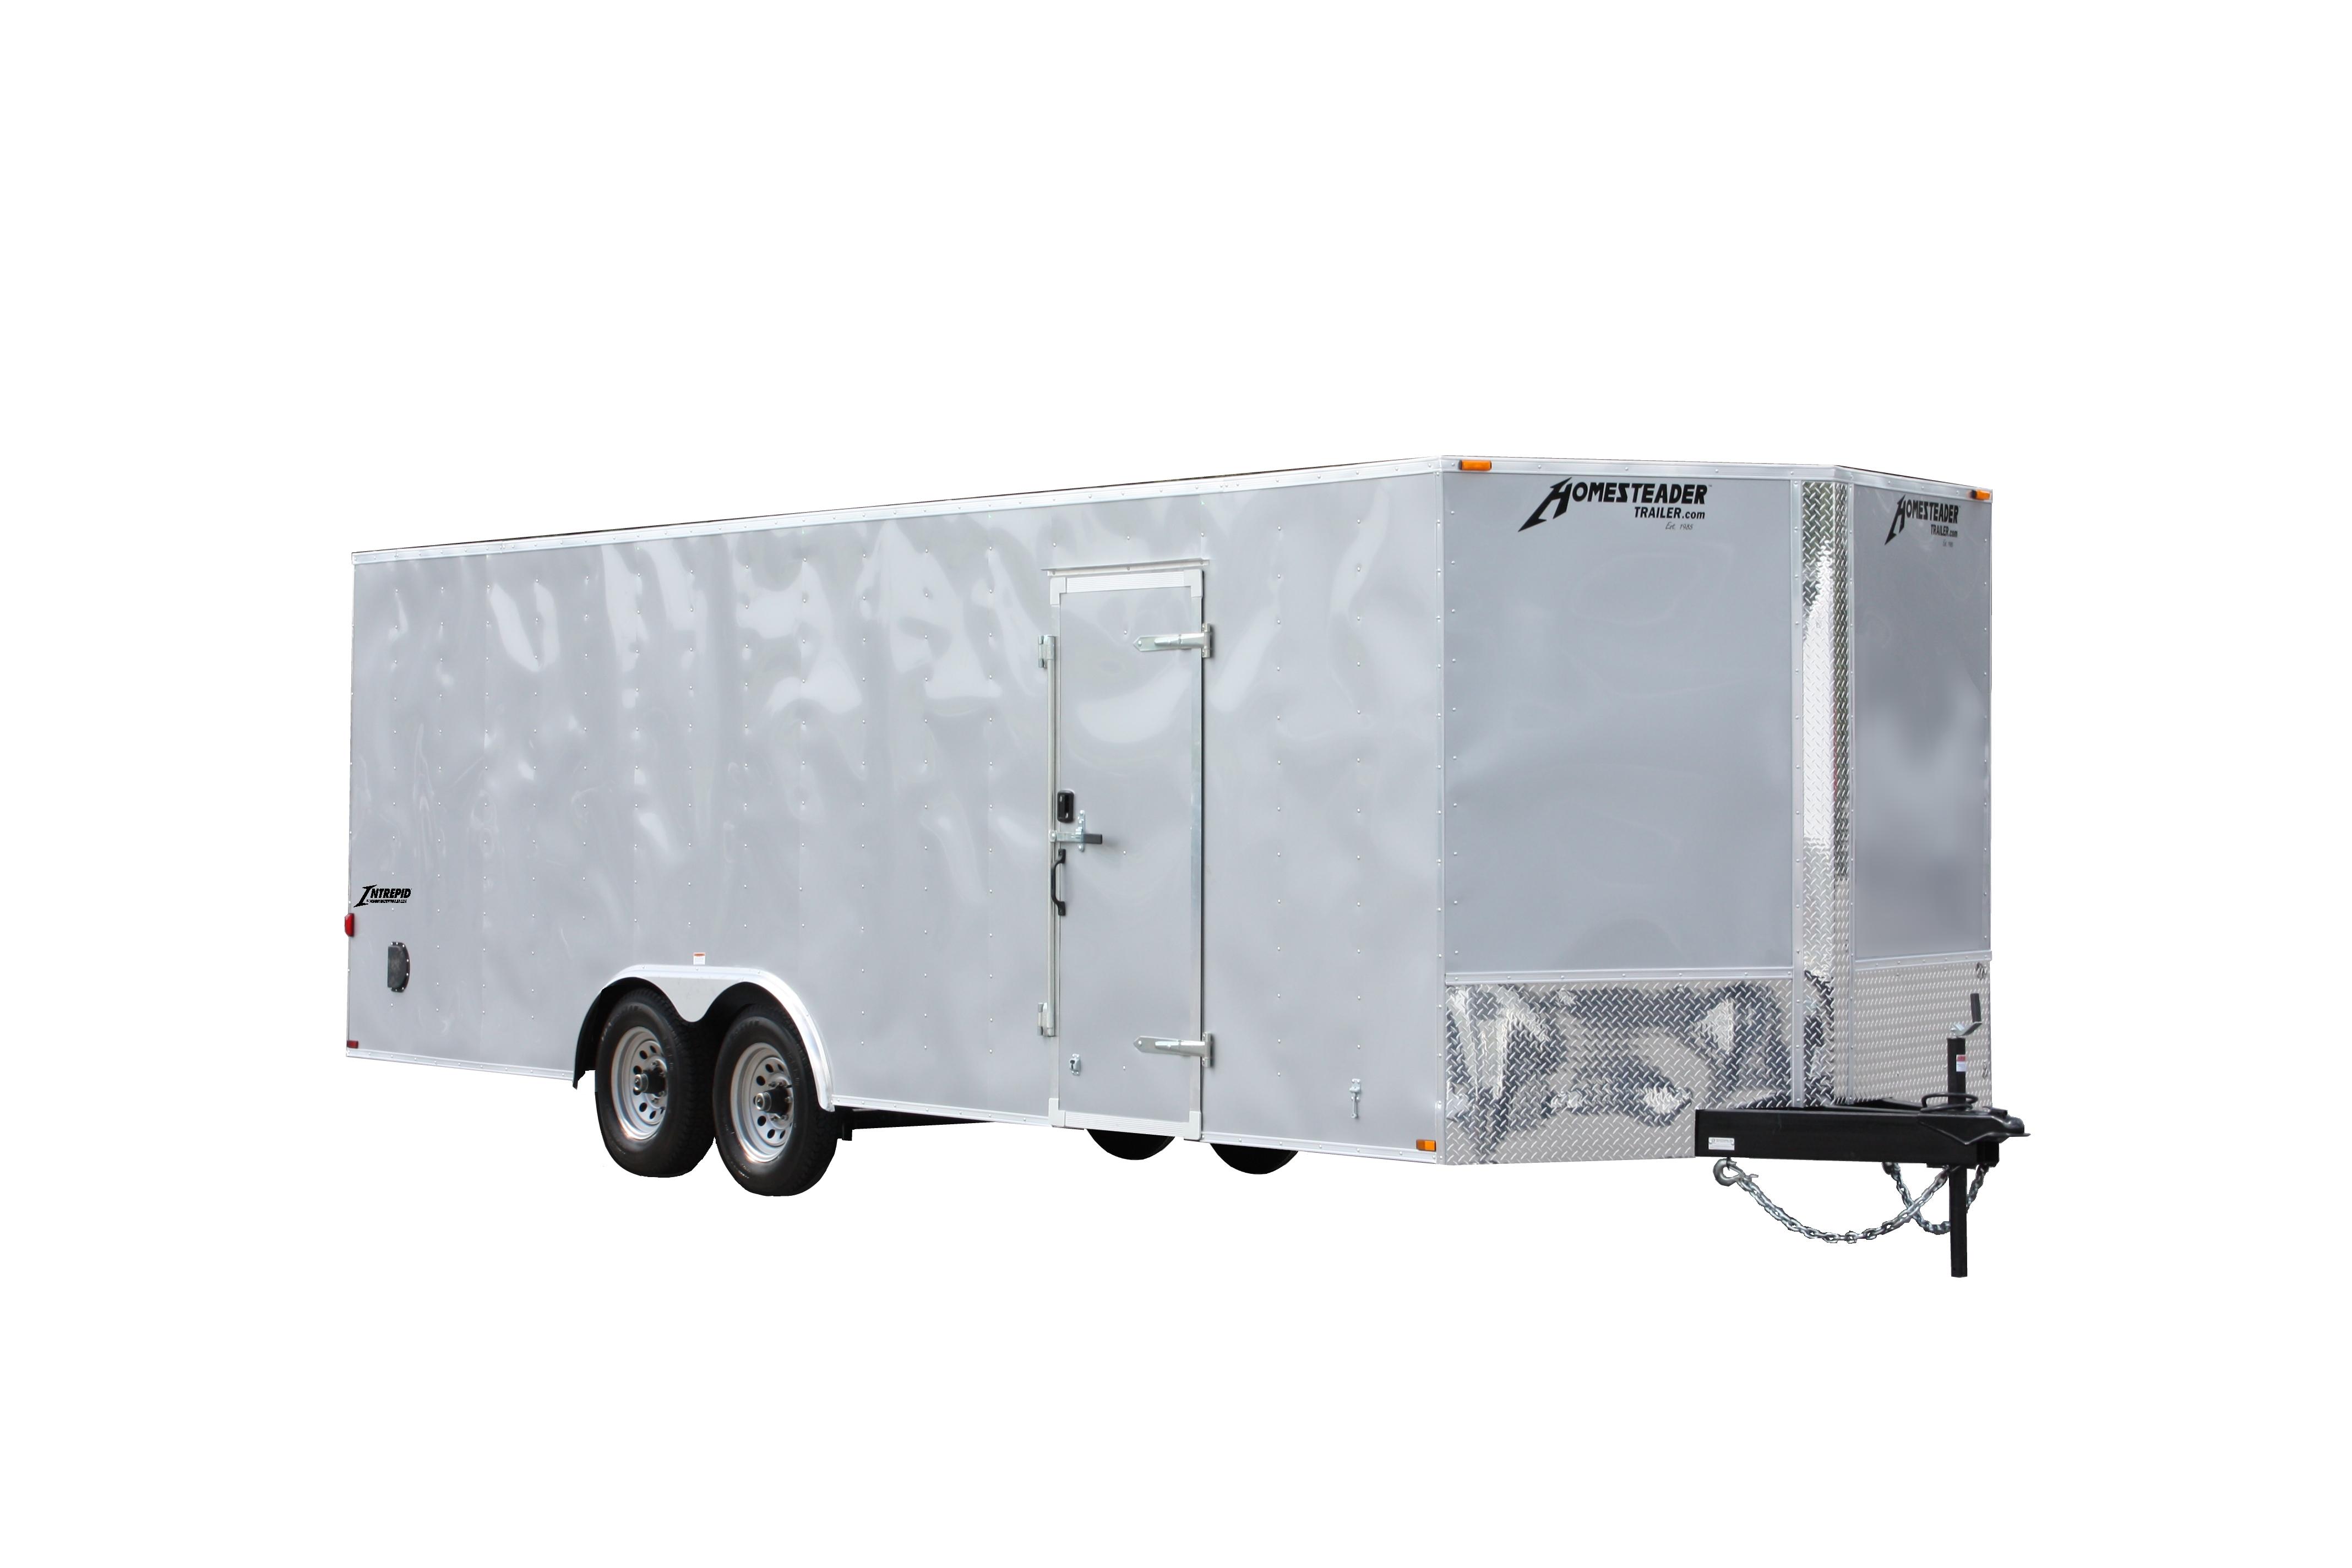 Aluma Motorcycle Trailer Wiring Diagram : Intrepid homesteader trailer